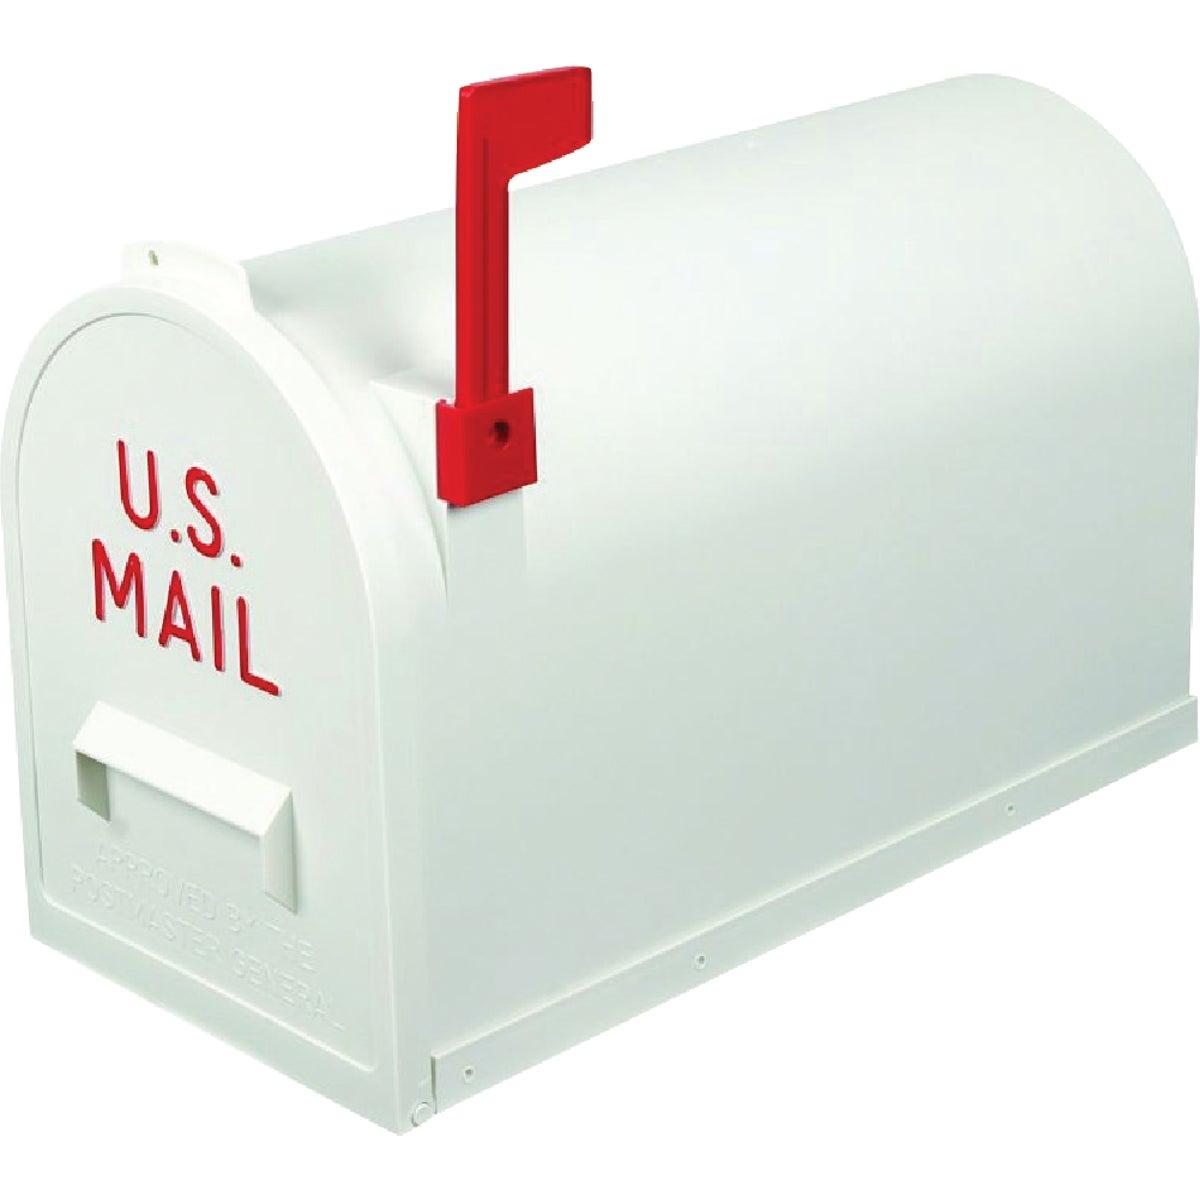 Flambeau T3 Plastic Post Mount Mailbox